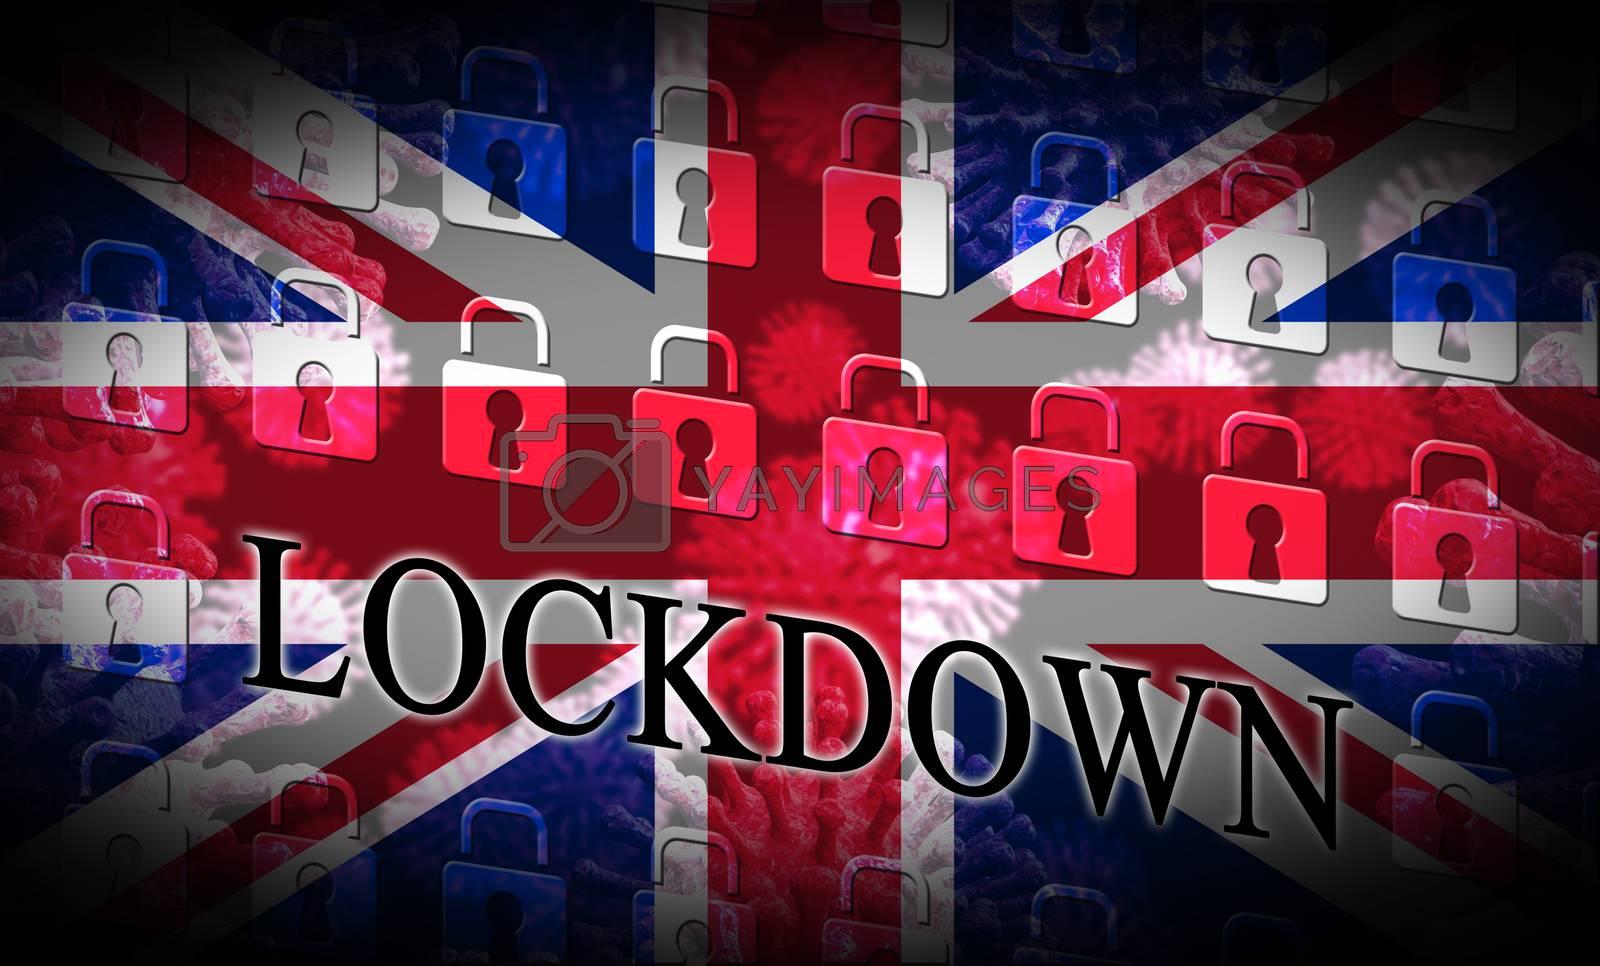 United Kingdom lockdown emergency preventing coronavirus spread or outbreak. Covid 19 UK precaution to lock down virus infection - 3d Illustration